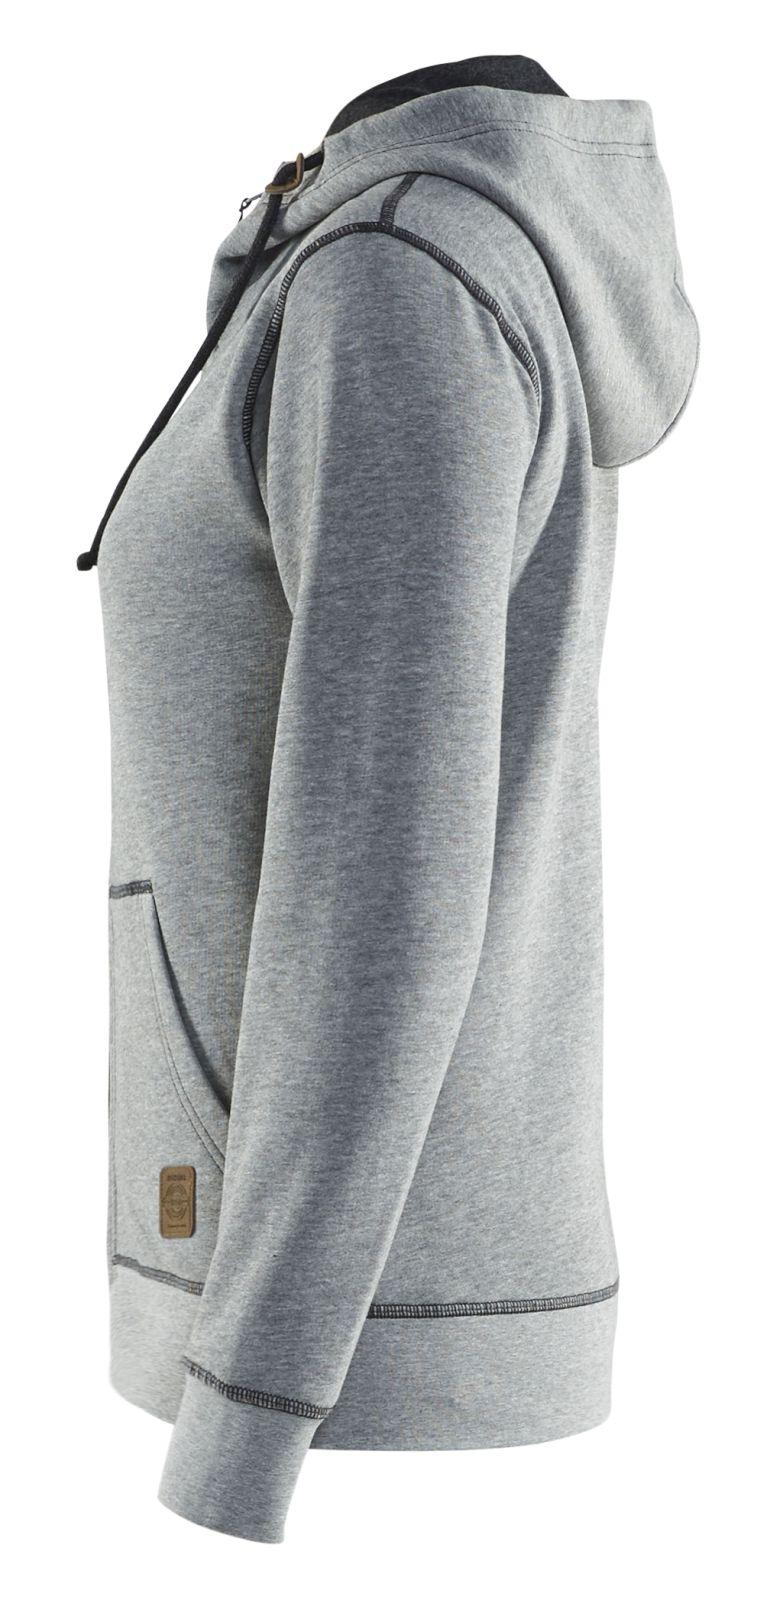 Blaklader Dames hooded sweatvesten 33731157 grijs melee(9000)